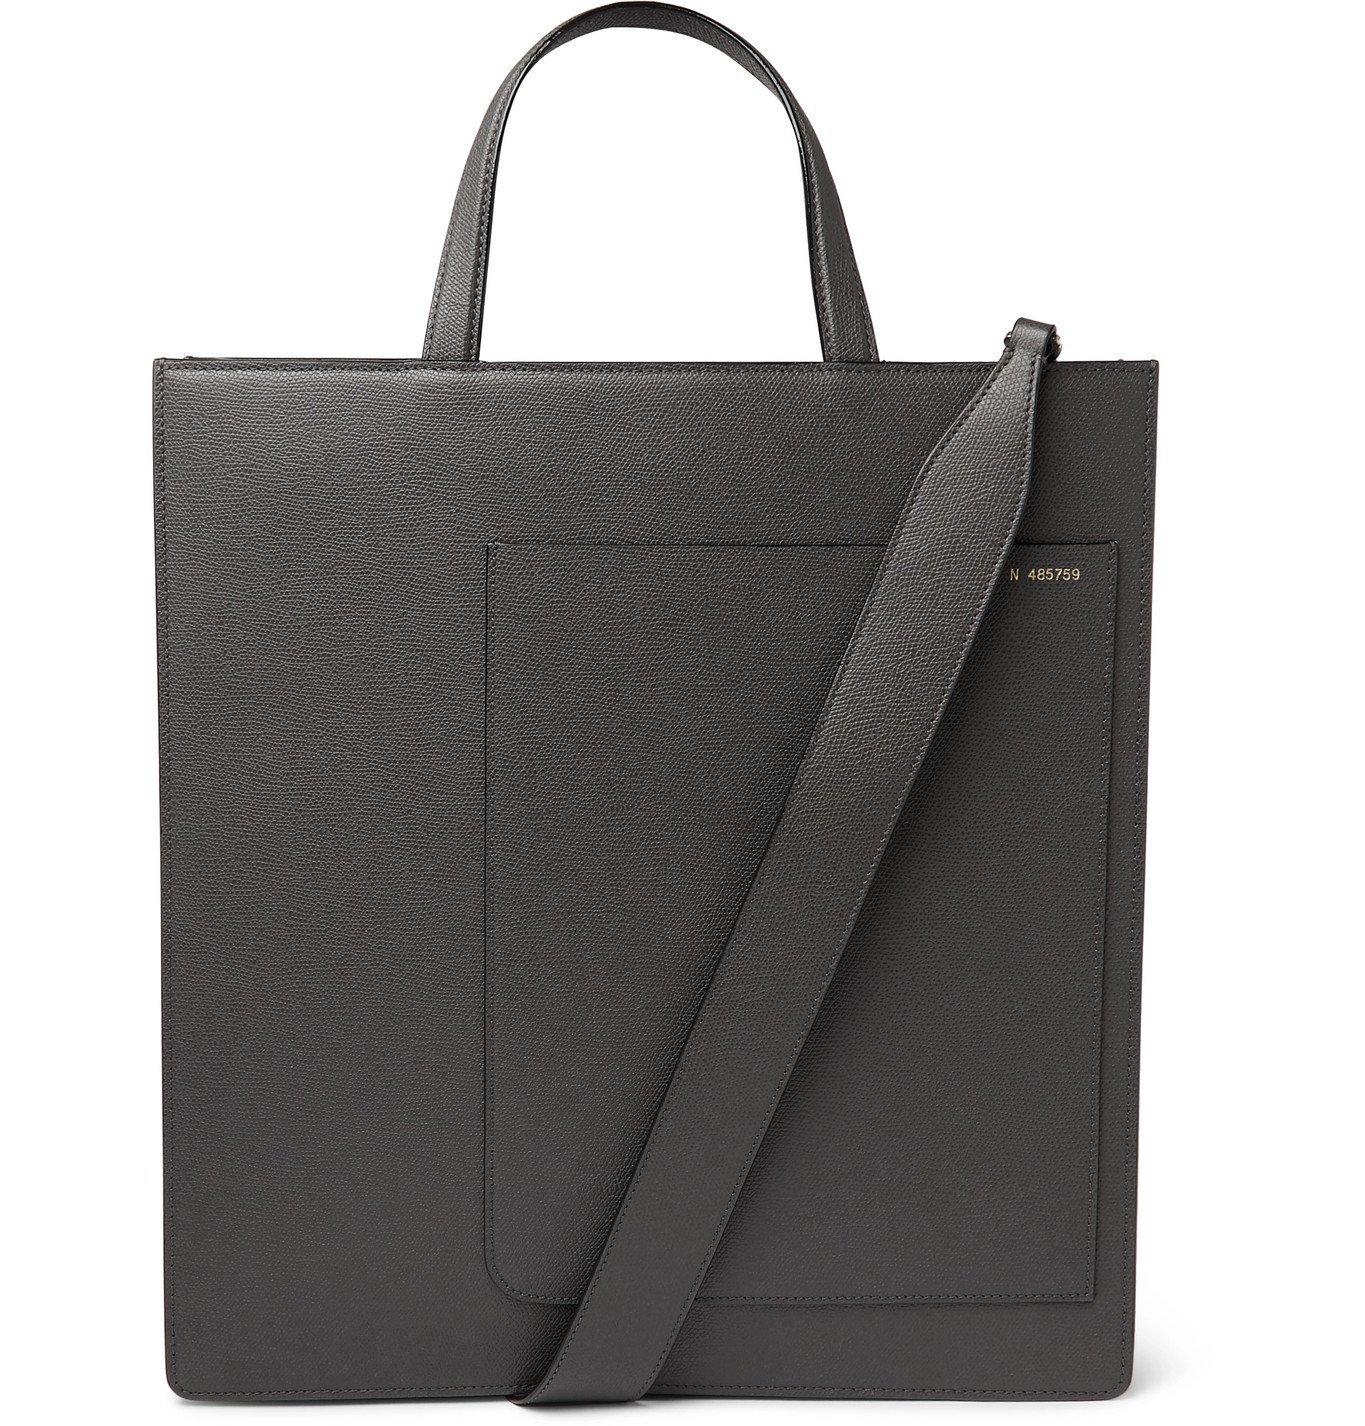 Photo: Valextra - Pebble-Grain Leather Tote Bag - Gray